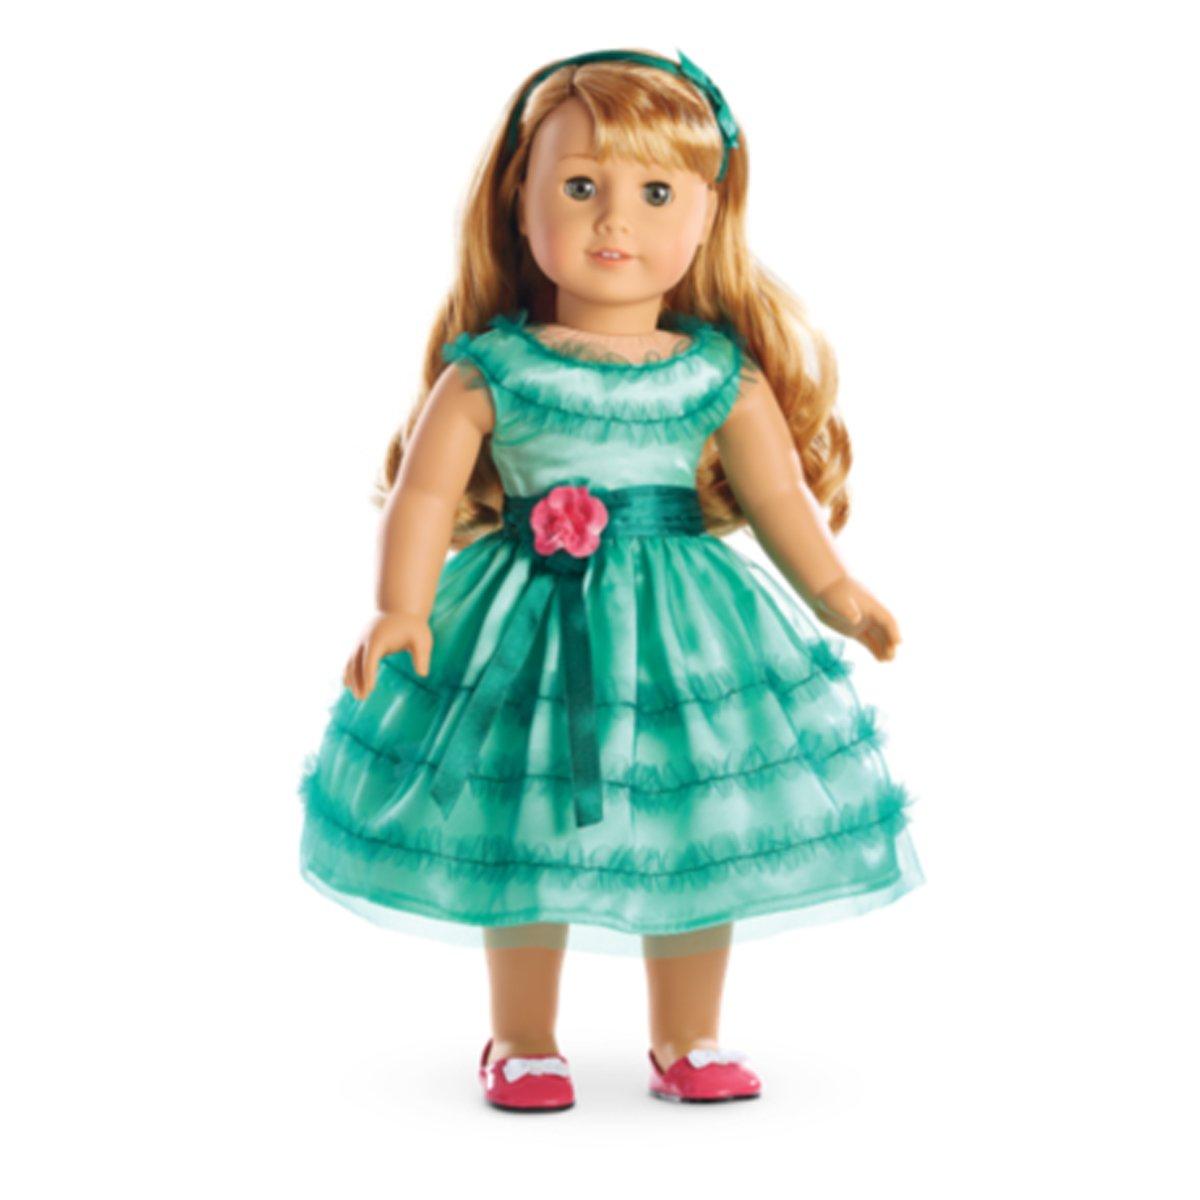 Amazon.com: American Girl Maryellen\'s Birthday Dress: Toys & Games